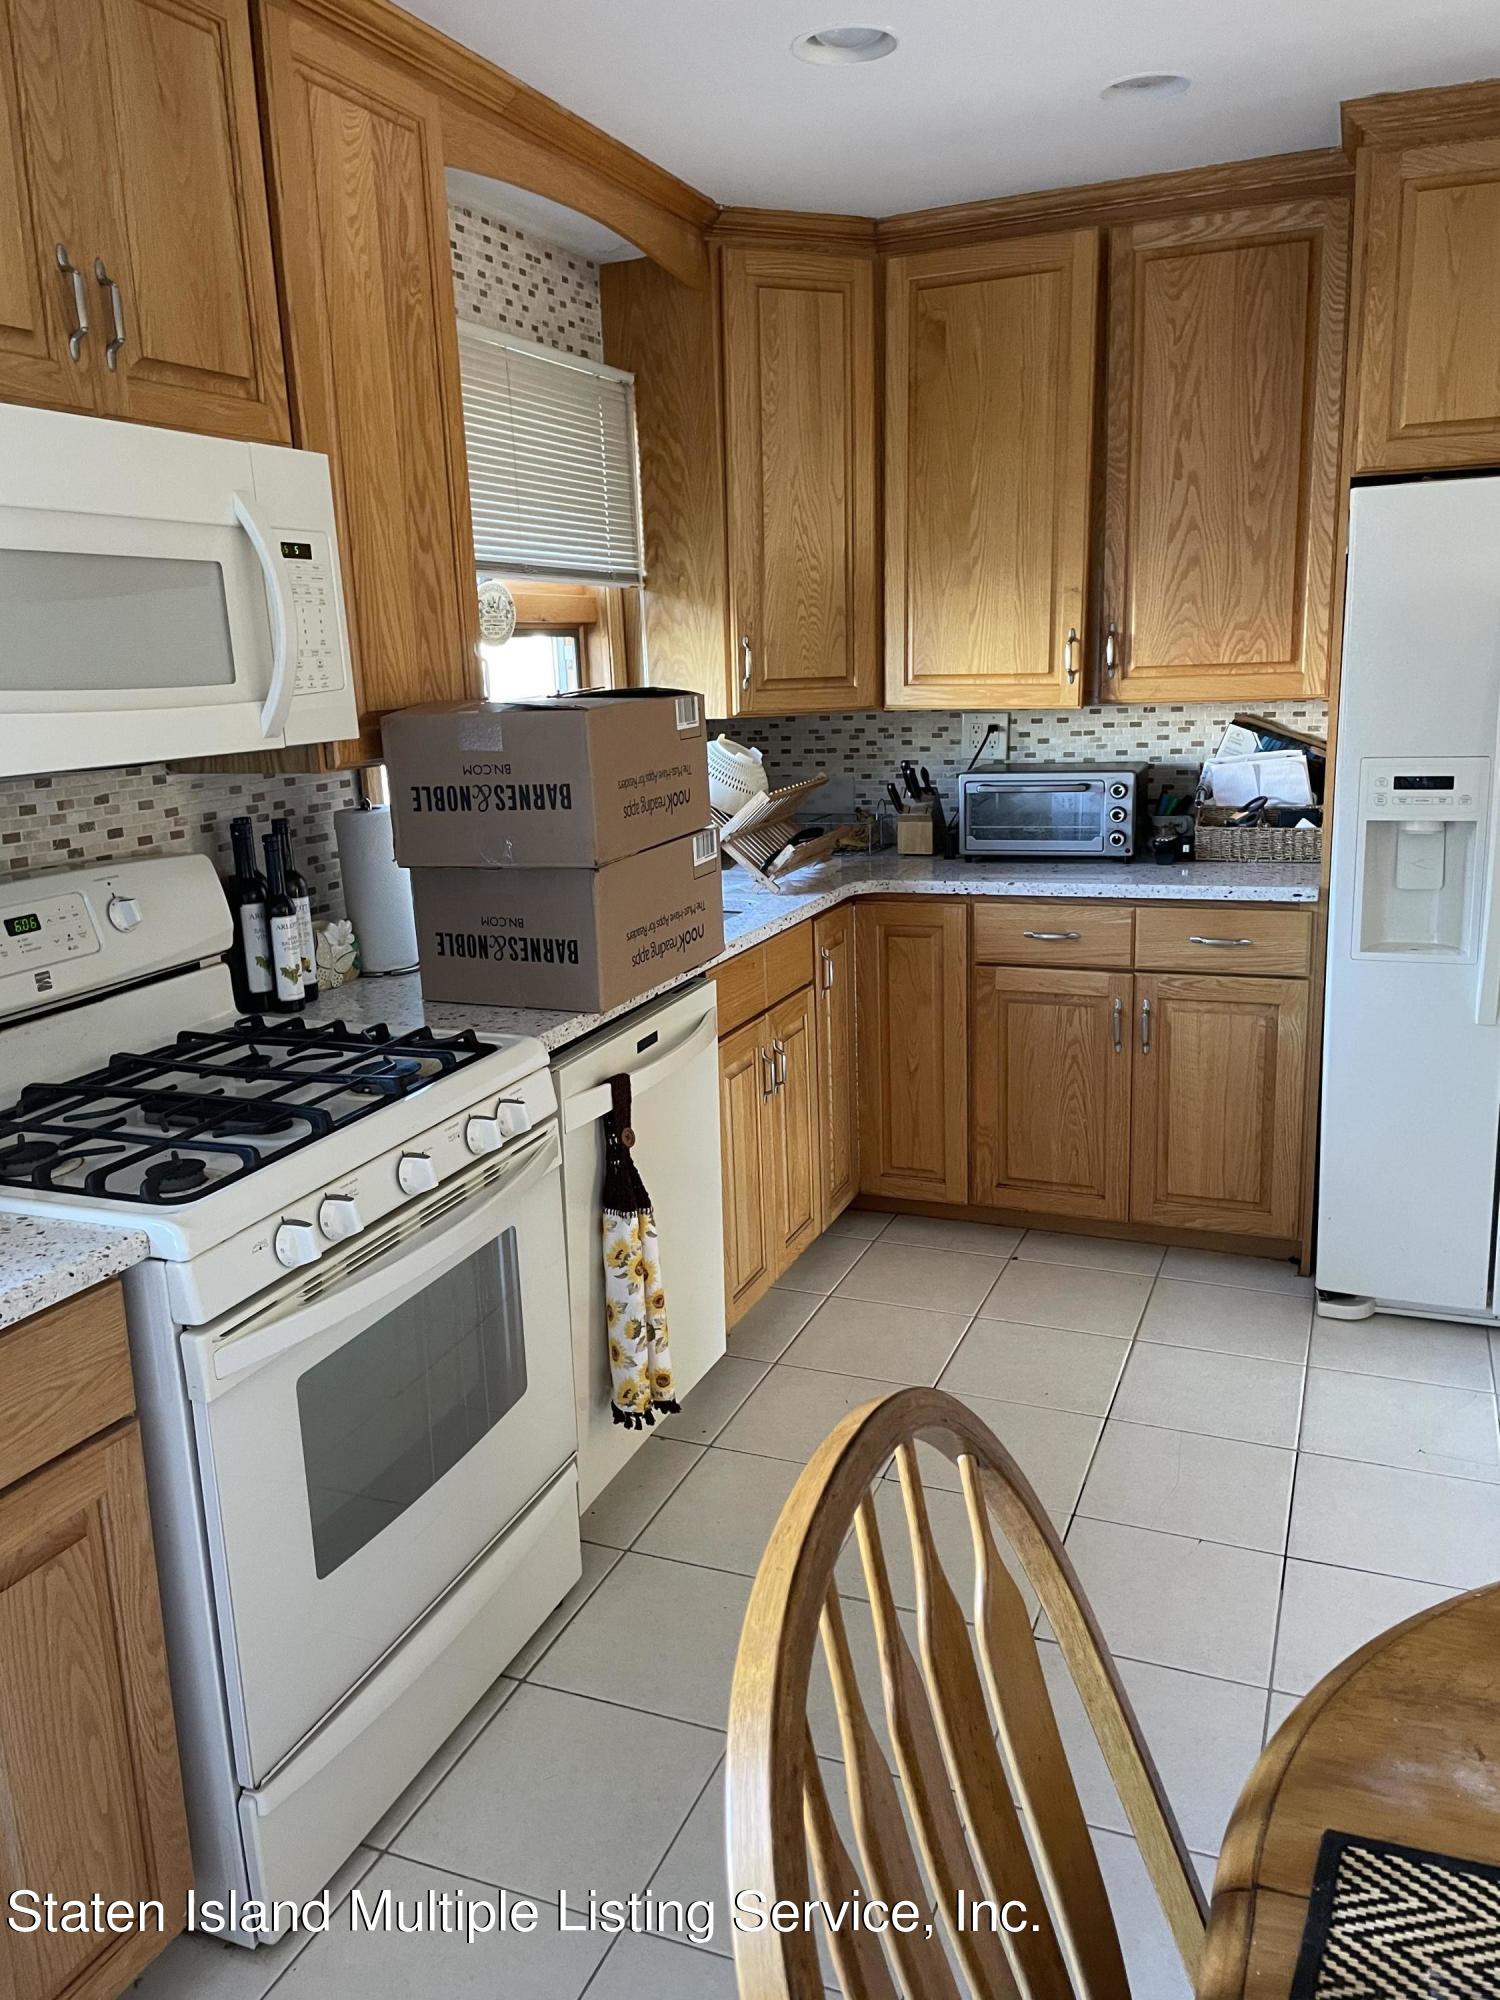 Single Family - Semi-Attached 453 Eltingville Boulevard  Staten Island, NY 10312, MLS-1147072-3